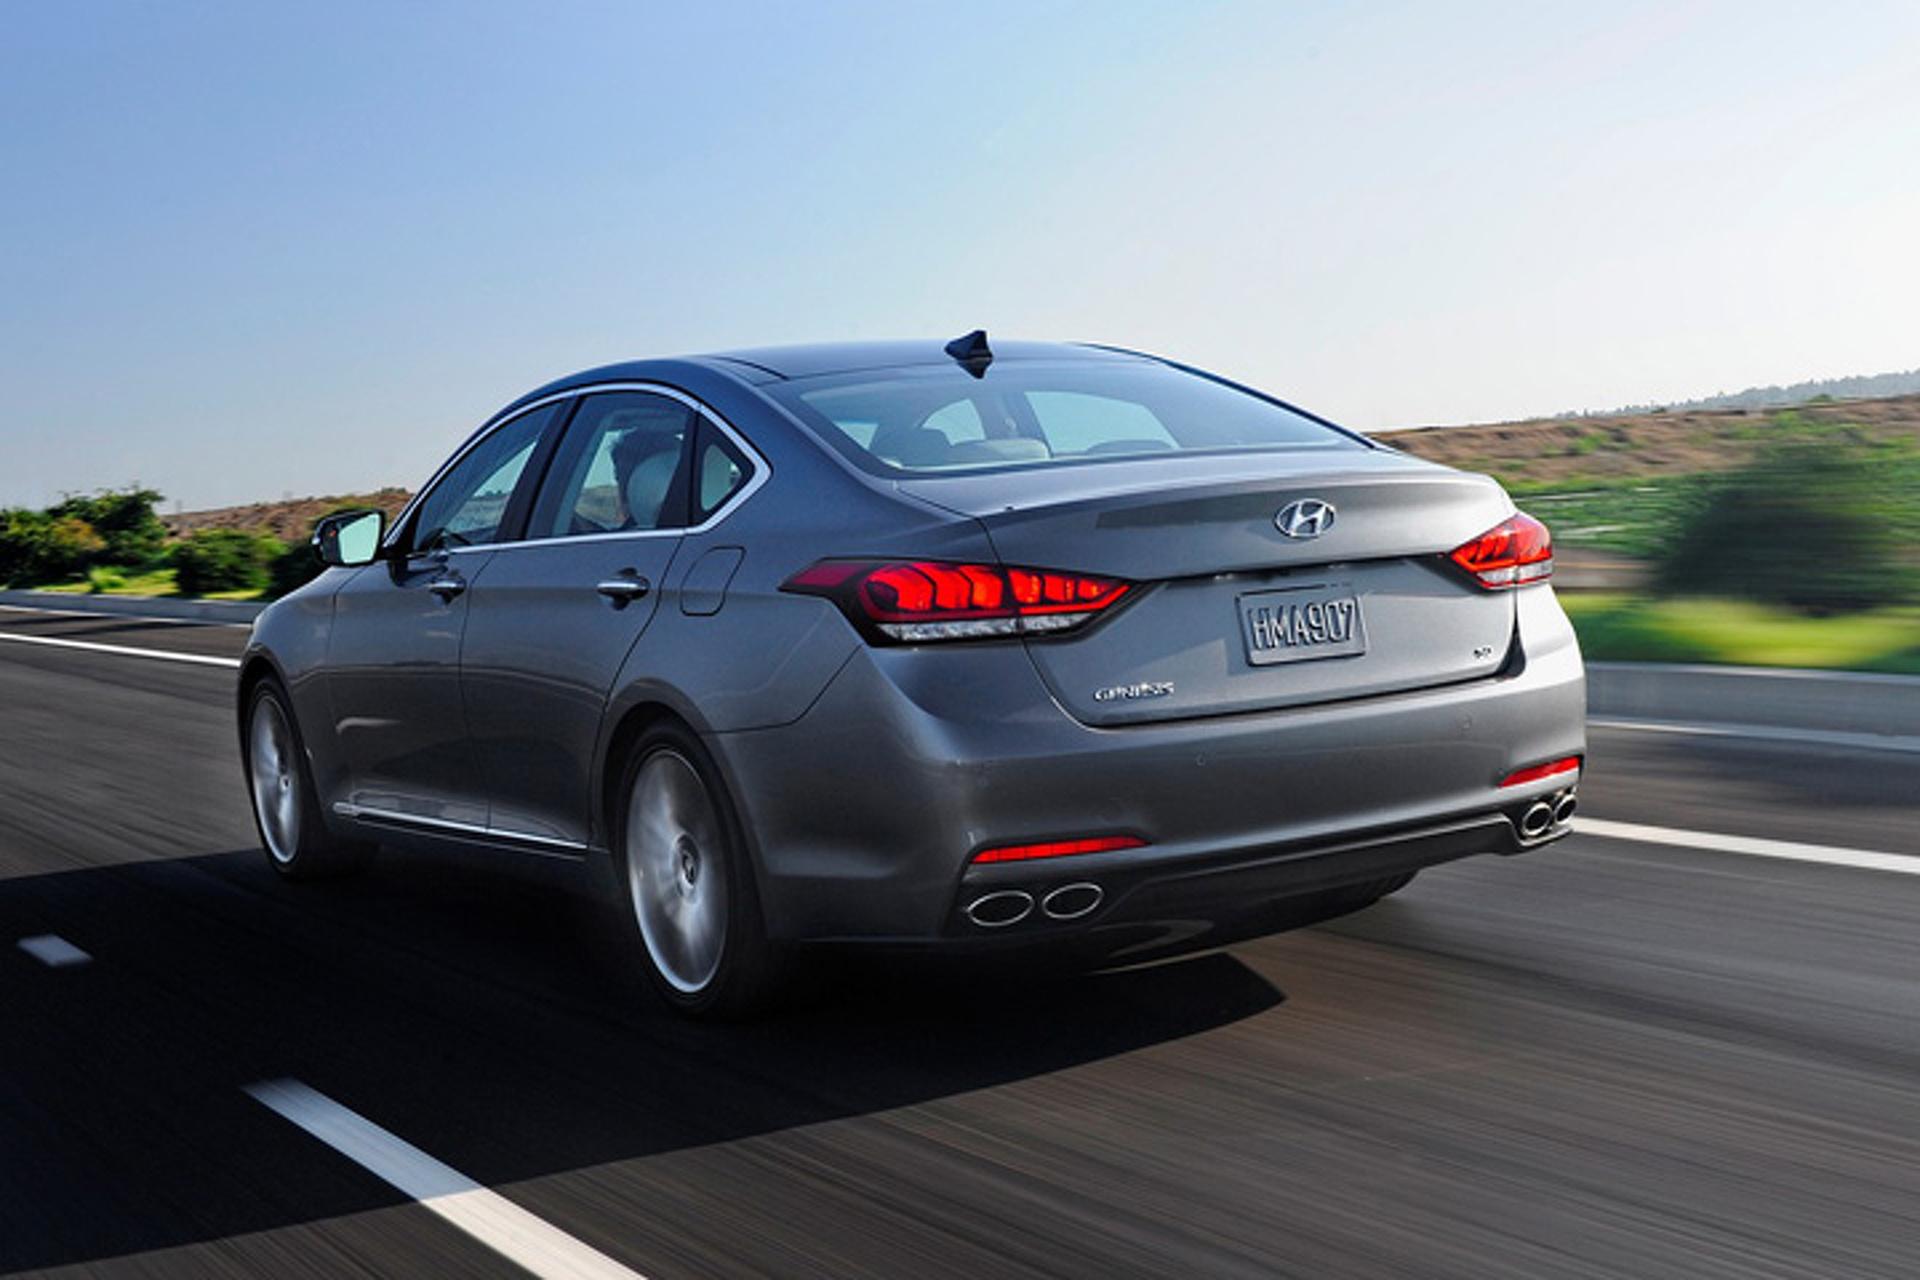 The 2015 Hyundai Genesis Anticipates and Slows for Speed Cameras